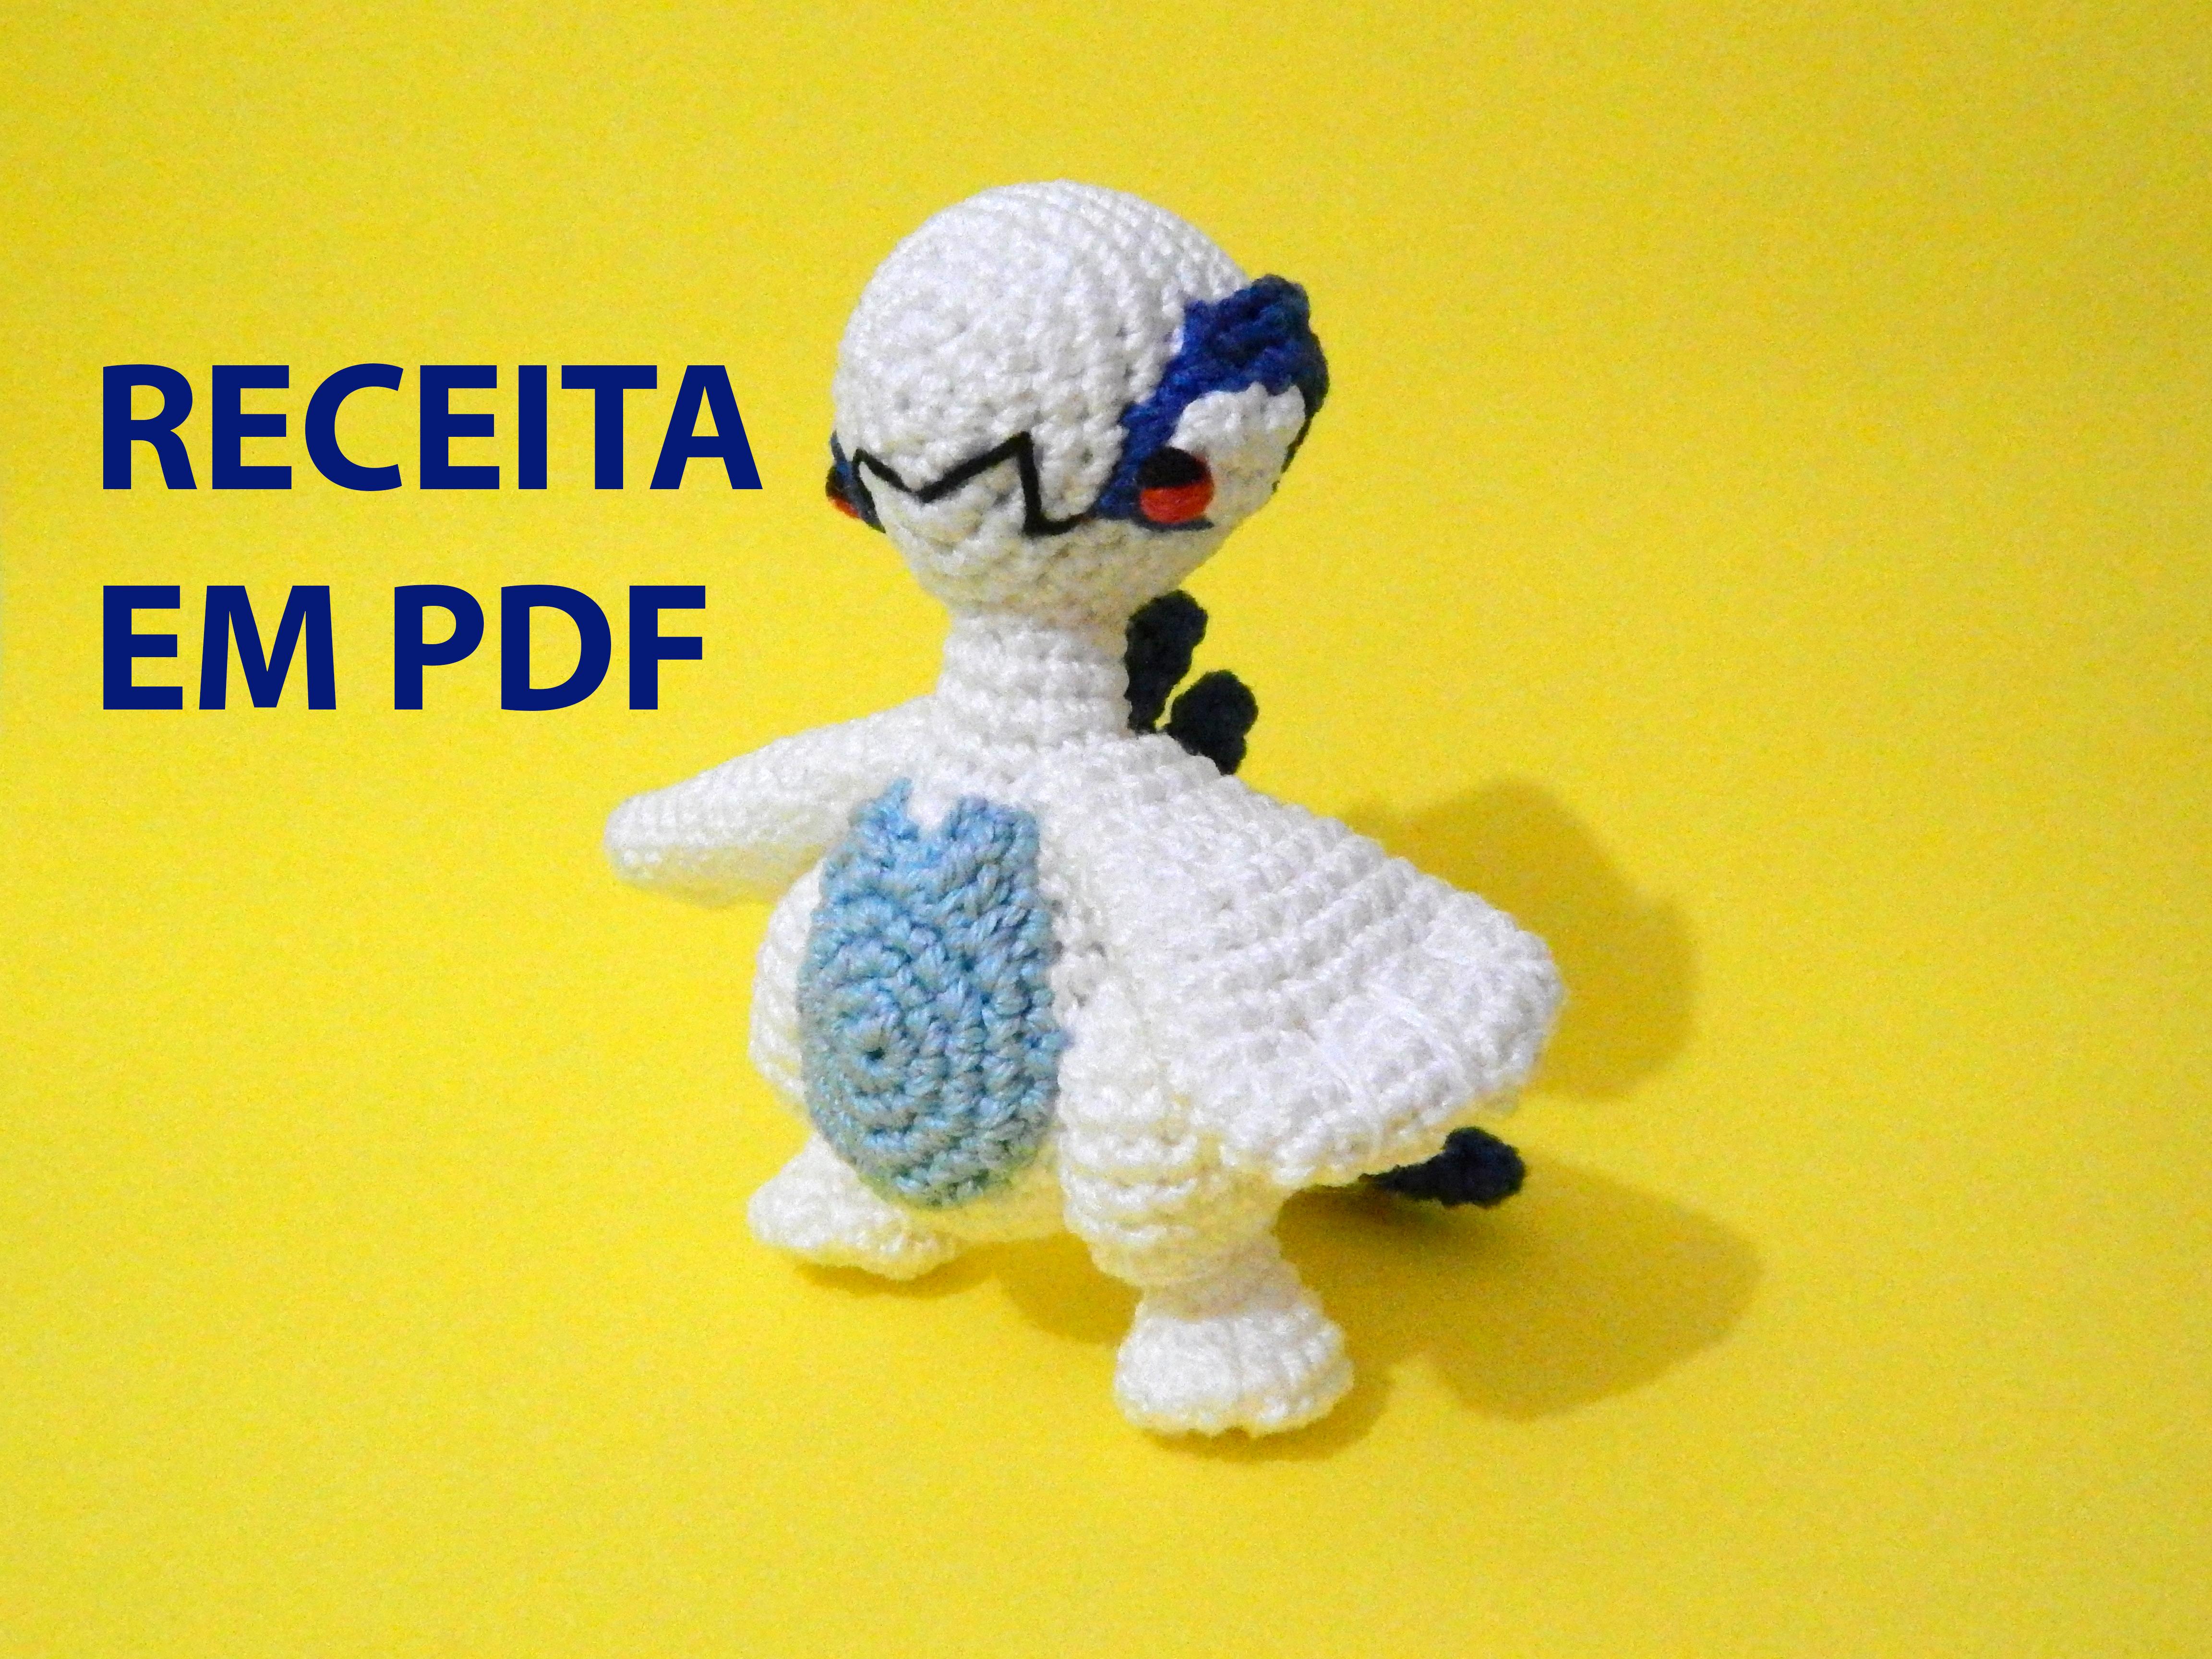 Amigurumi To Sell : Receita em PDF - Amigurumi Lugia chibi Icedeb Elo7